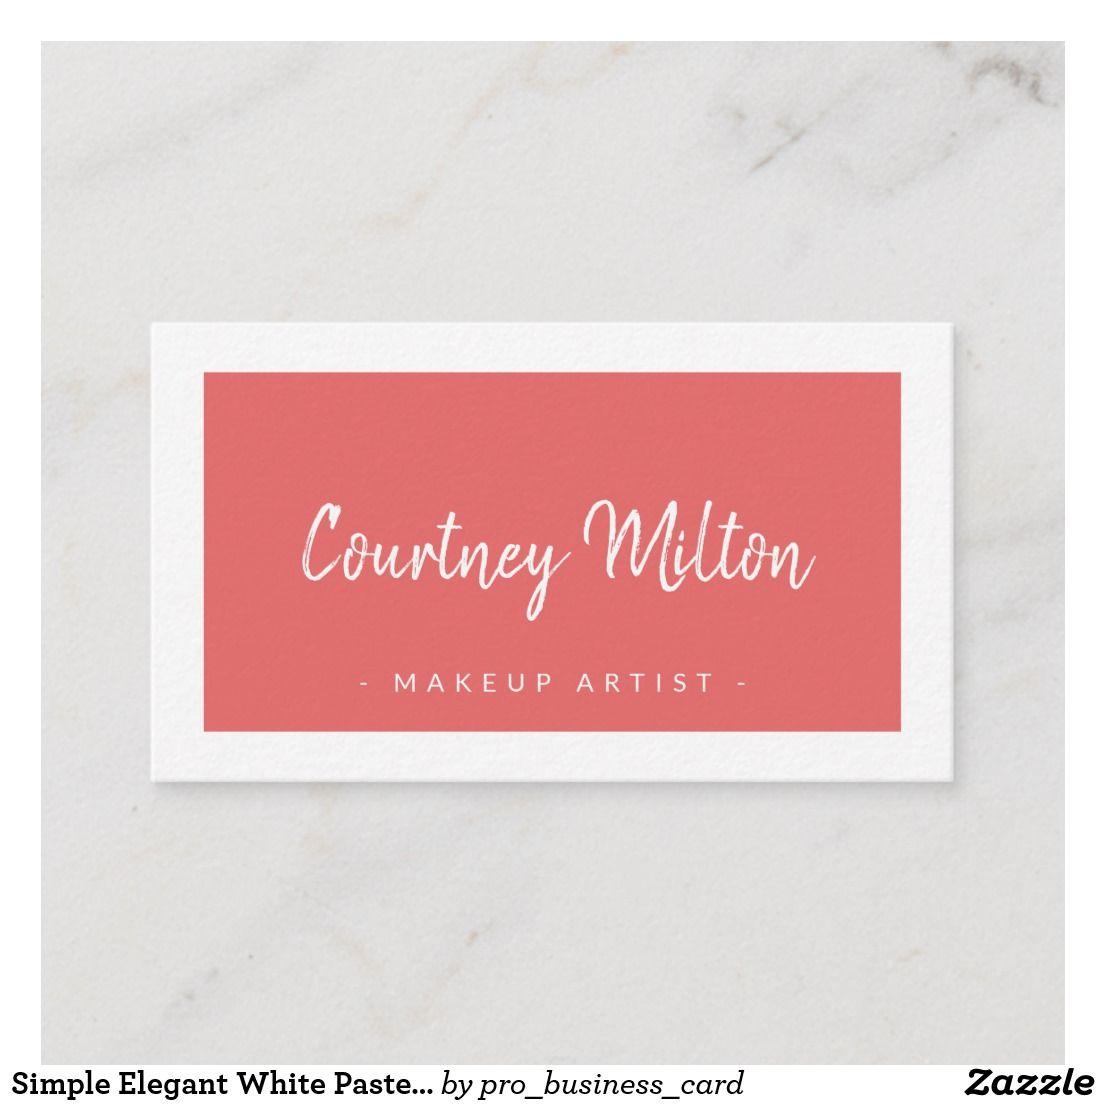 Simple Elegant White Pastel Makeup Artist Business Card